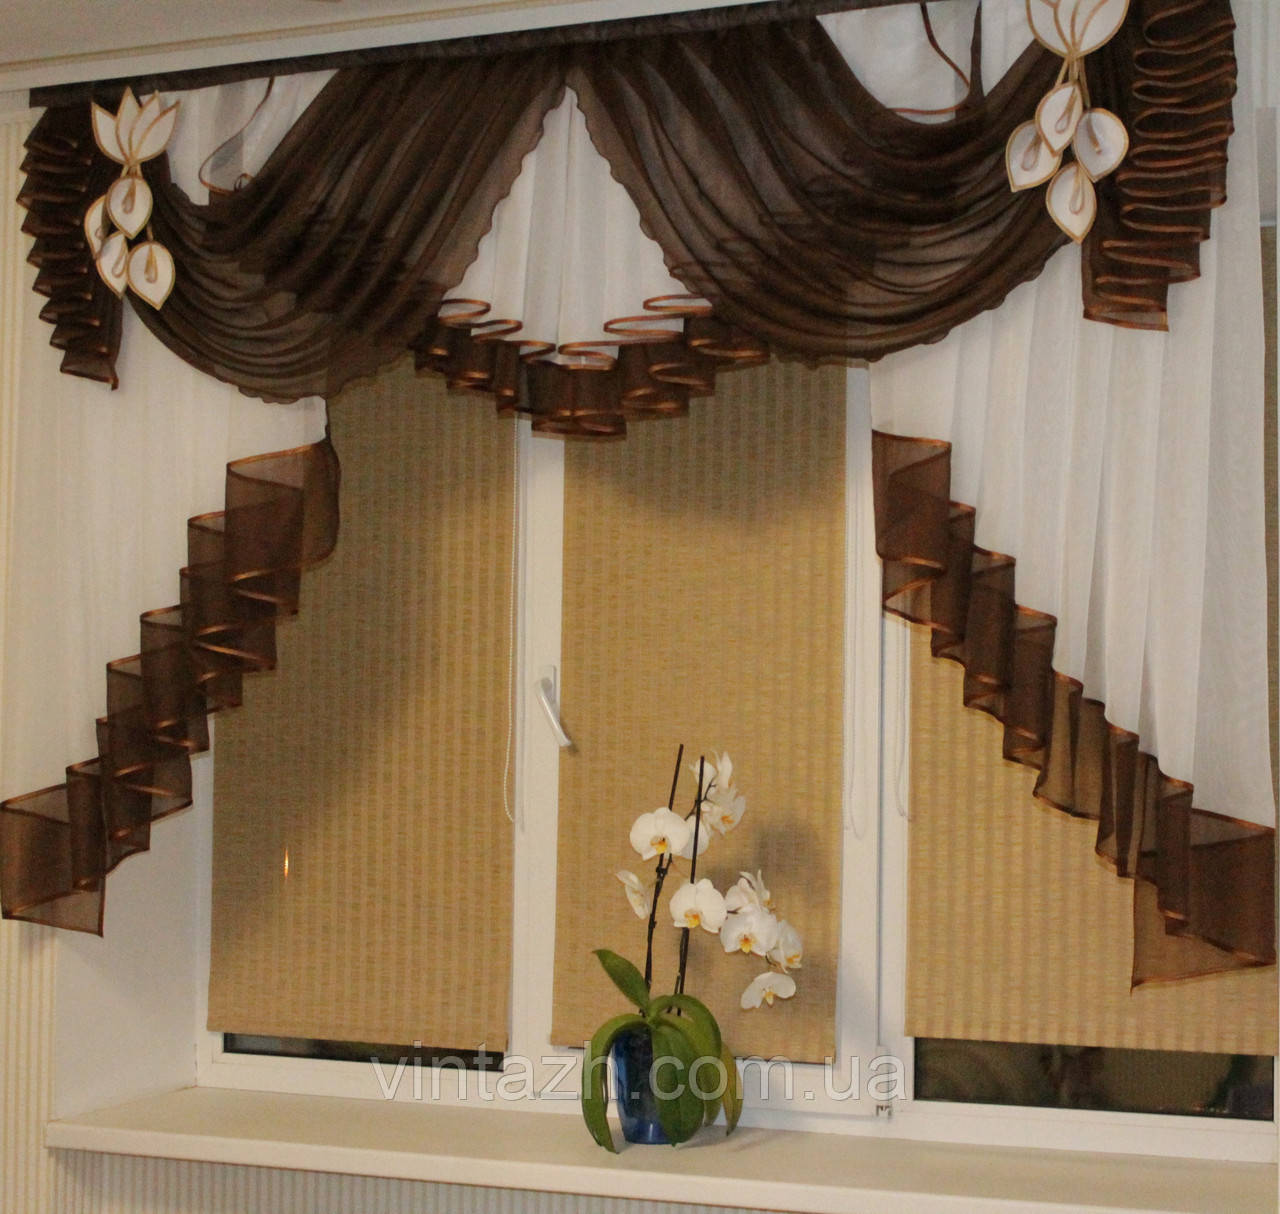 Ламбрекен со шторами для кухни